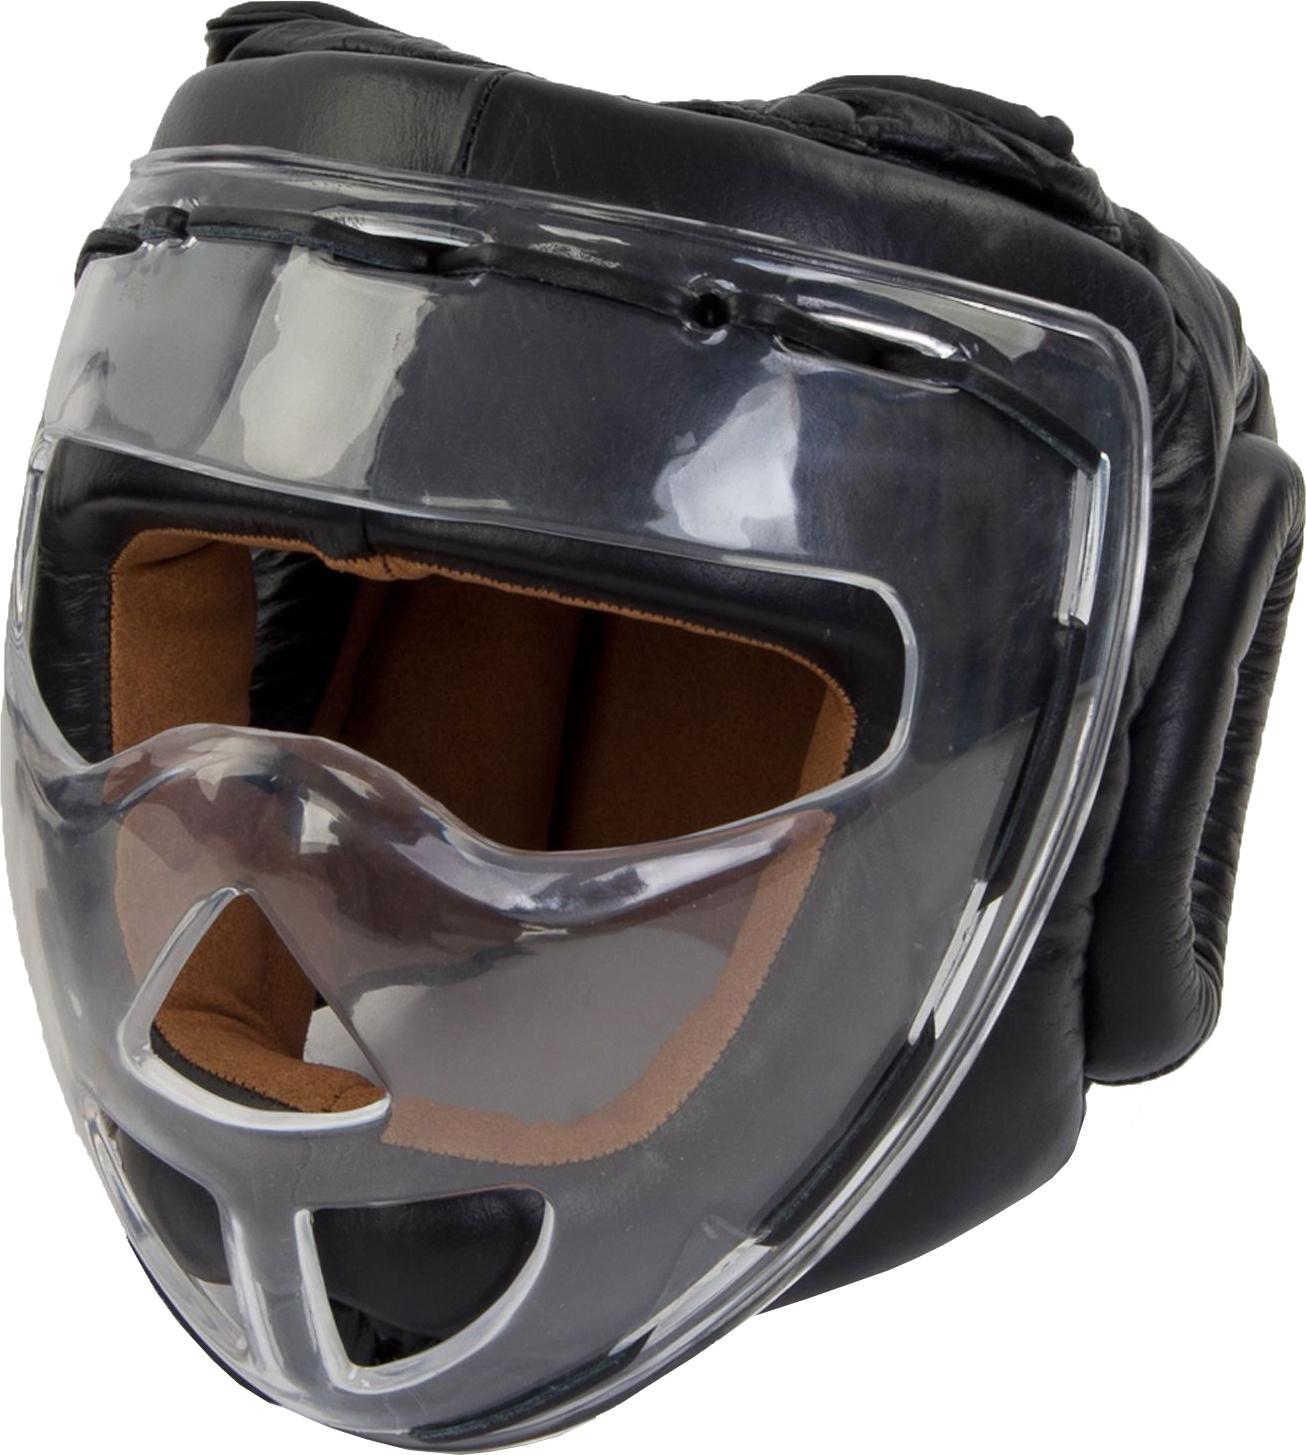 Боксерский шлем Jabb JE 2104 черный M